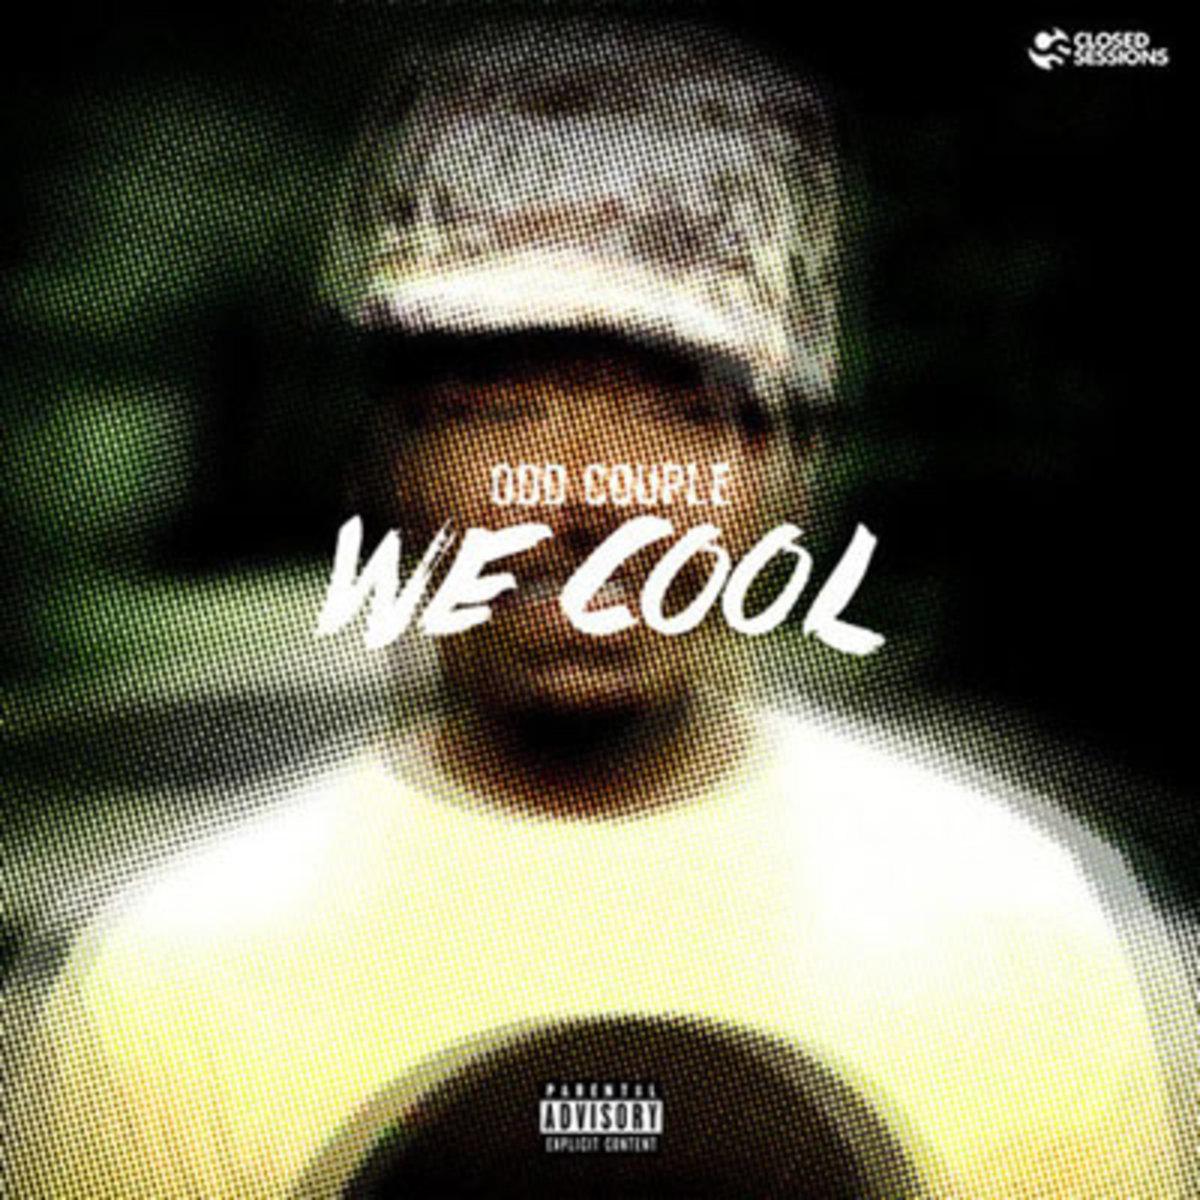 oddcouple-wecool.jpg